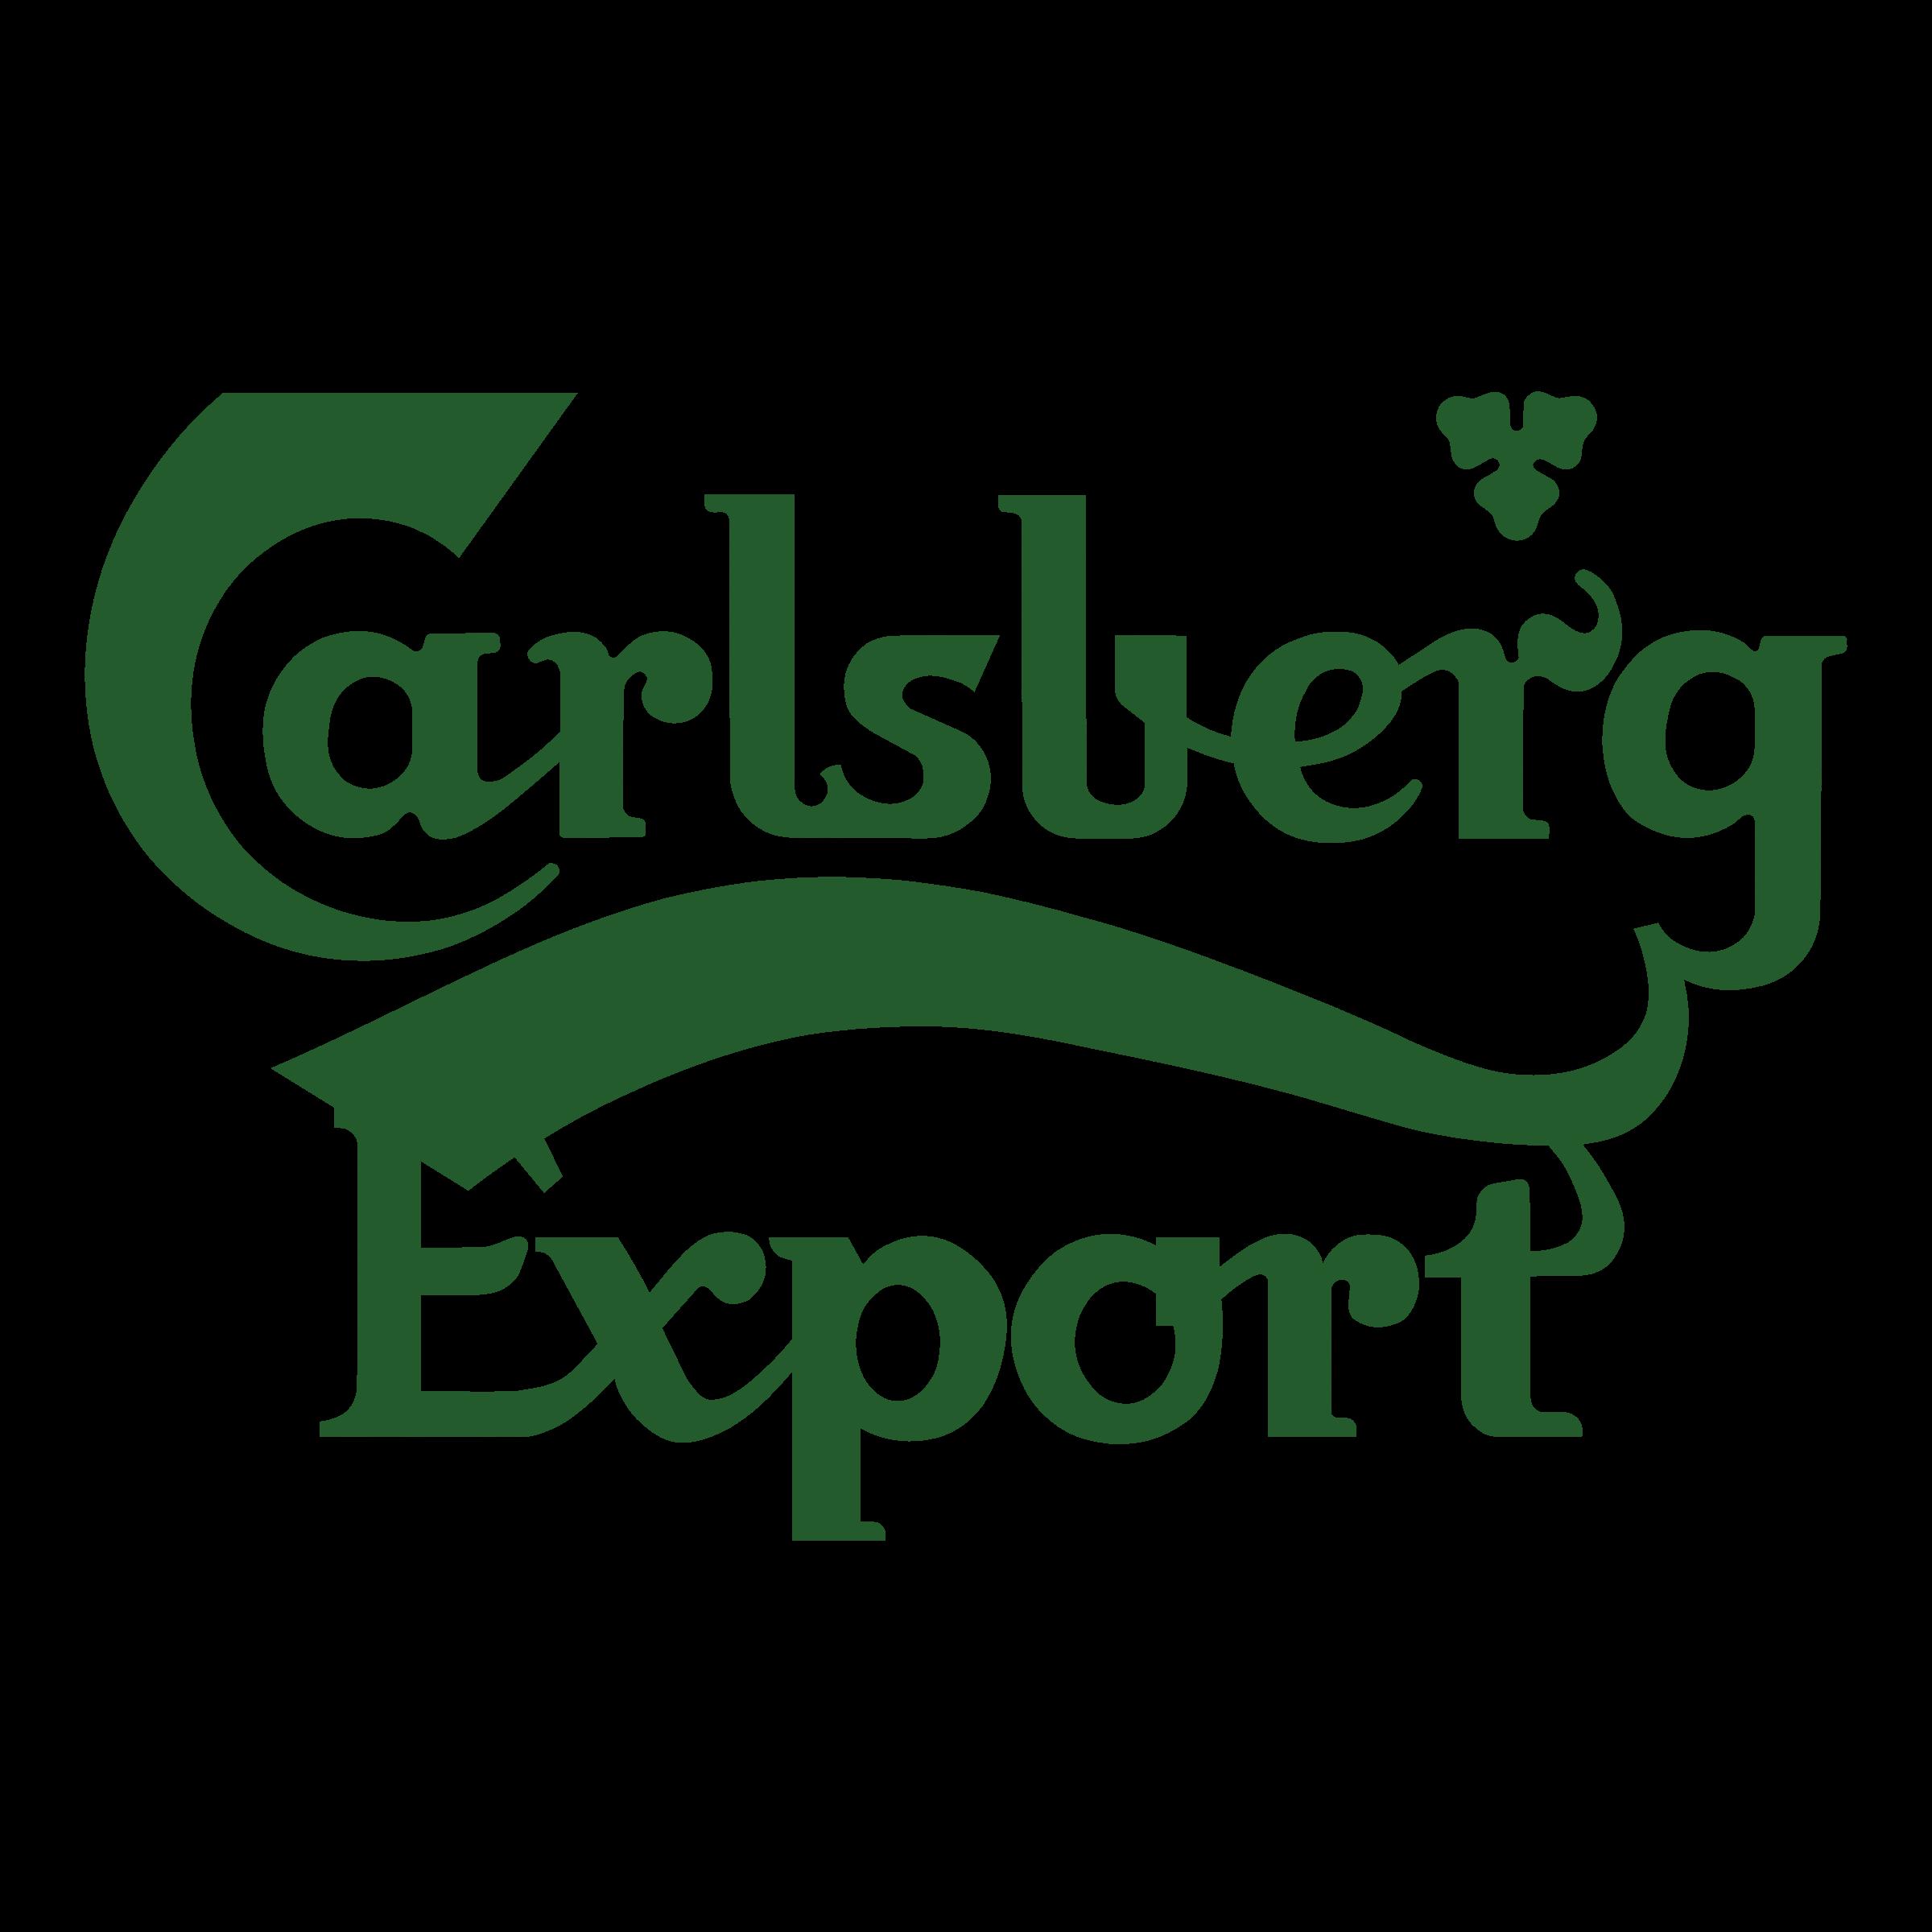 Carlsberg Logo Png Transparen